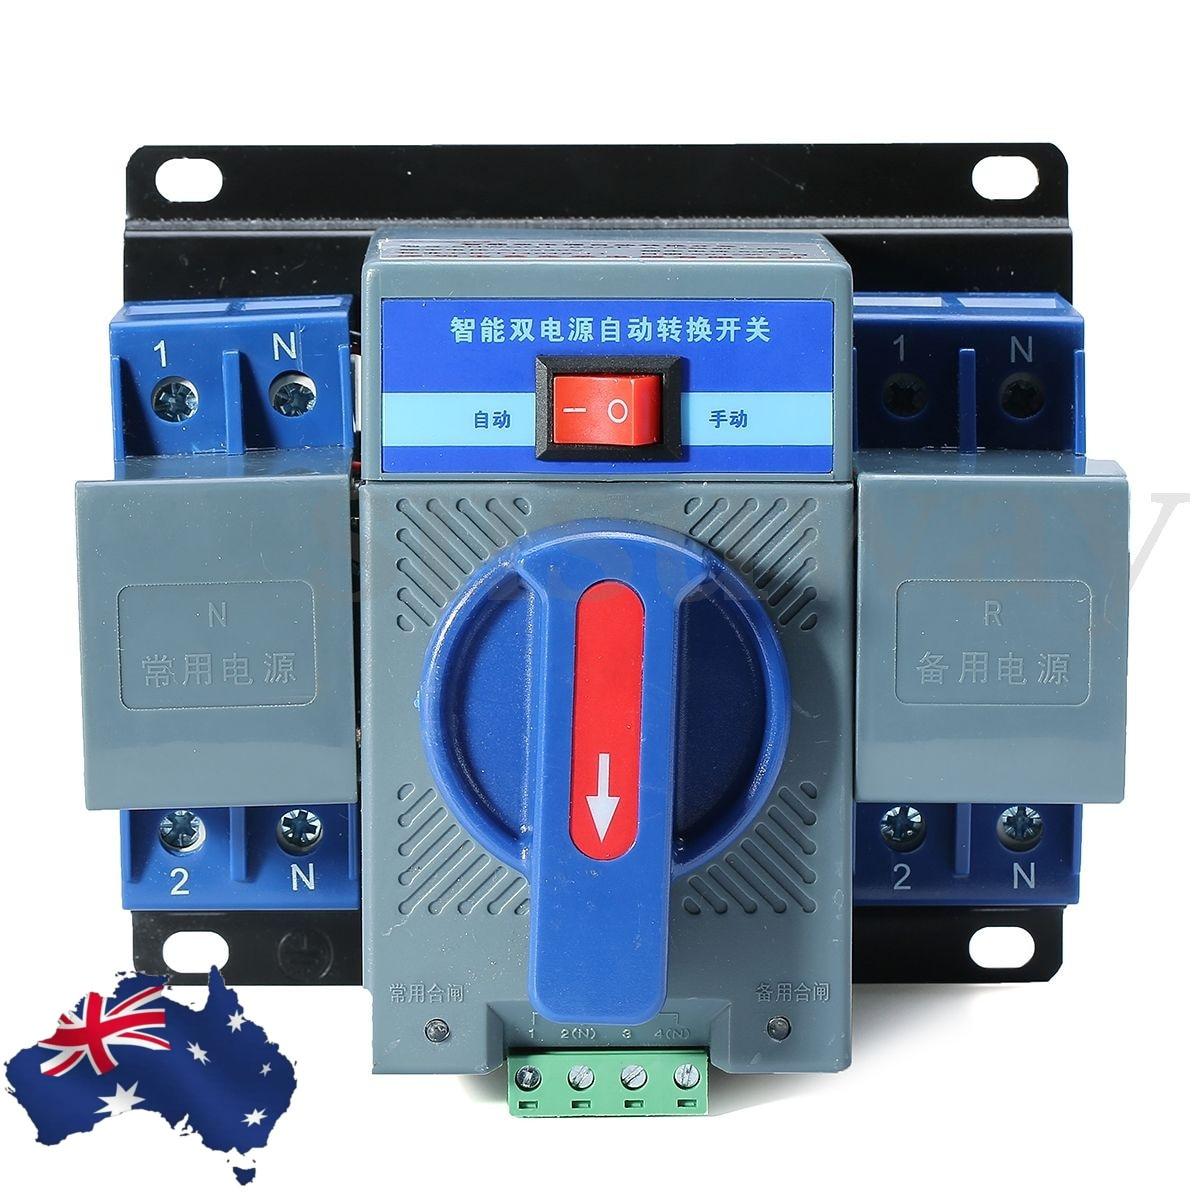 New 1Pcs 63A 2P 50HZ/60HZ Dual Power Automatic Transfer Switch 150*137*118mm Automatic Power Converter CircuitBreaker White BlueNew 1Pcs 63A 2P 50HZ/60HZ Dual Power Automatic Transfer Switch 150*137*118mm Automatic Power Converter CircuitBreaker White Blue